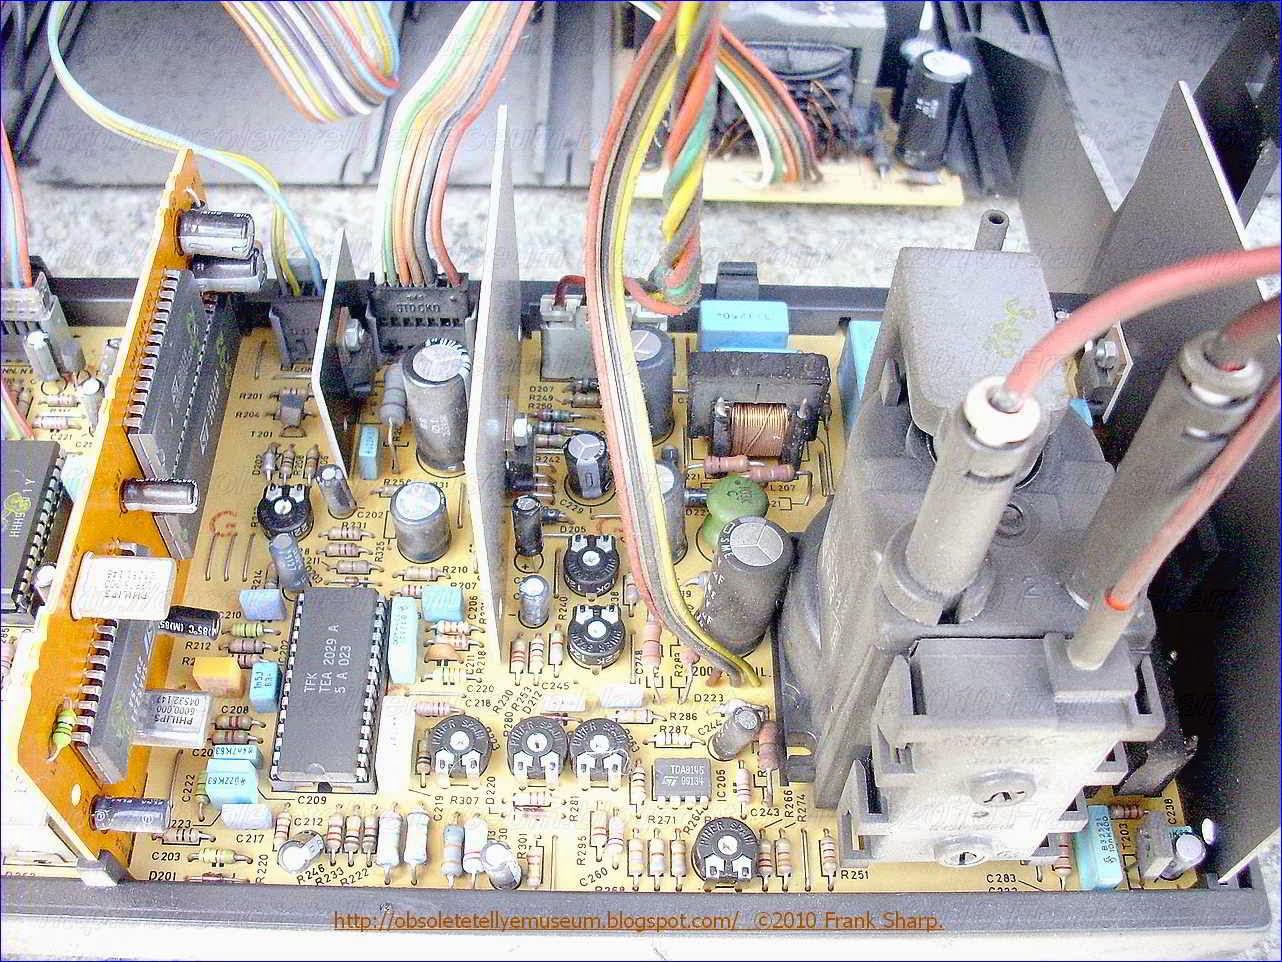 Obsolete Technology Tellye Mivar 28v2e Tvd Chassis Tv3536 1 Hobby Electronics Circuits Input Trigger Synchronized Monostable Imgh 06663 Tvm